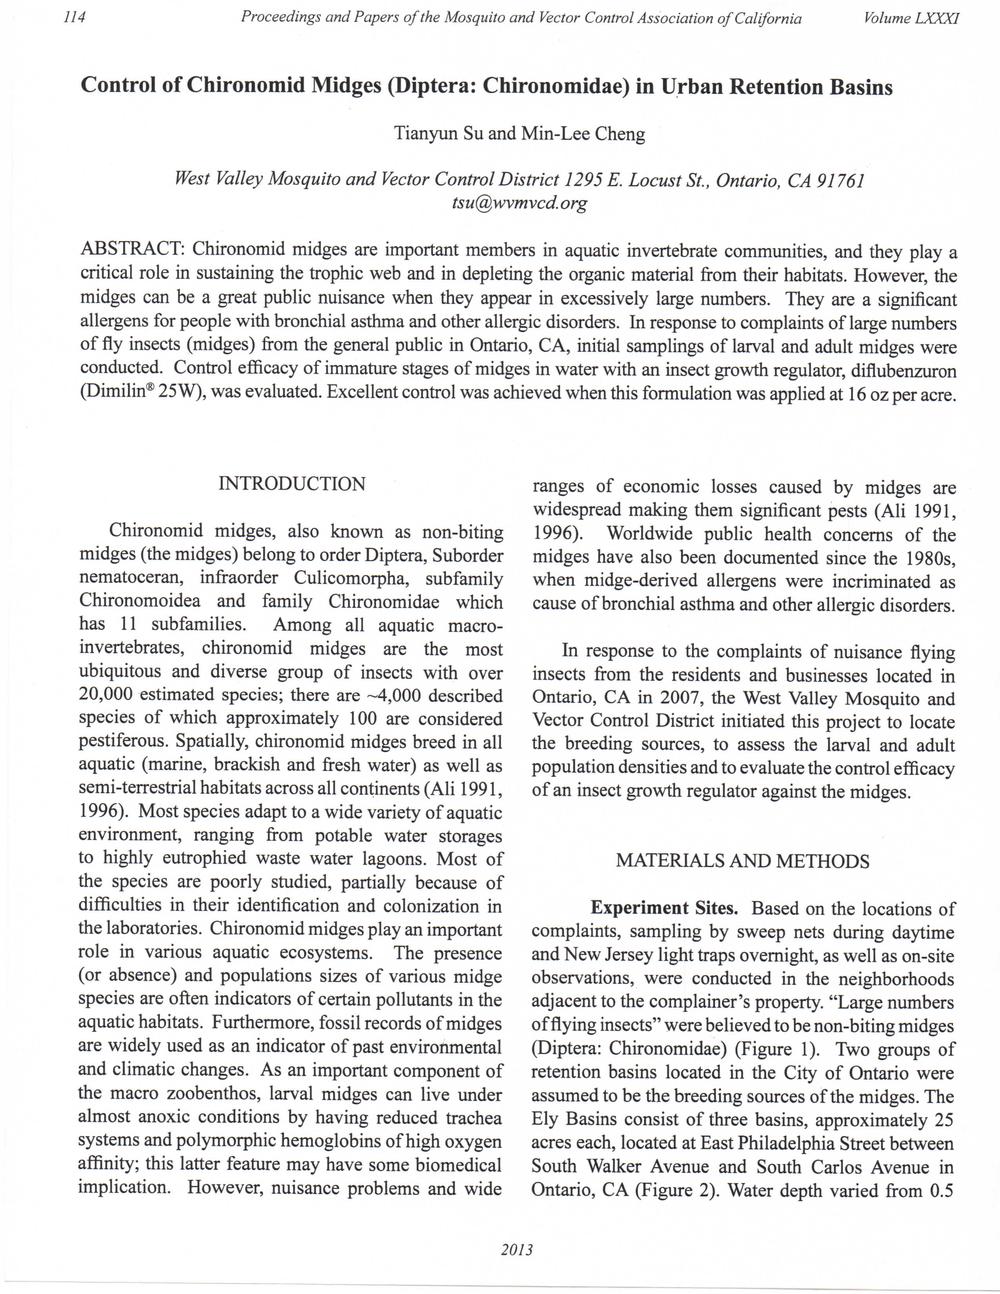 Midge control-MVCAC Vol. 81 PP.114-121_Page_1.png